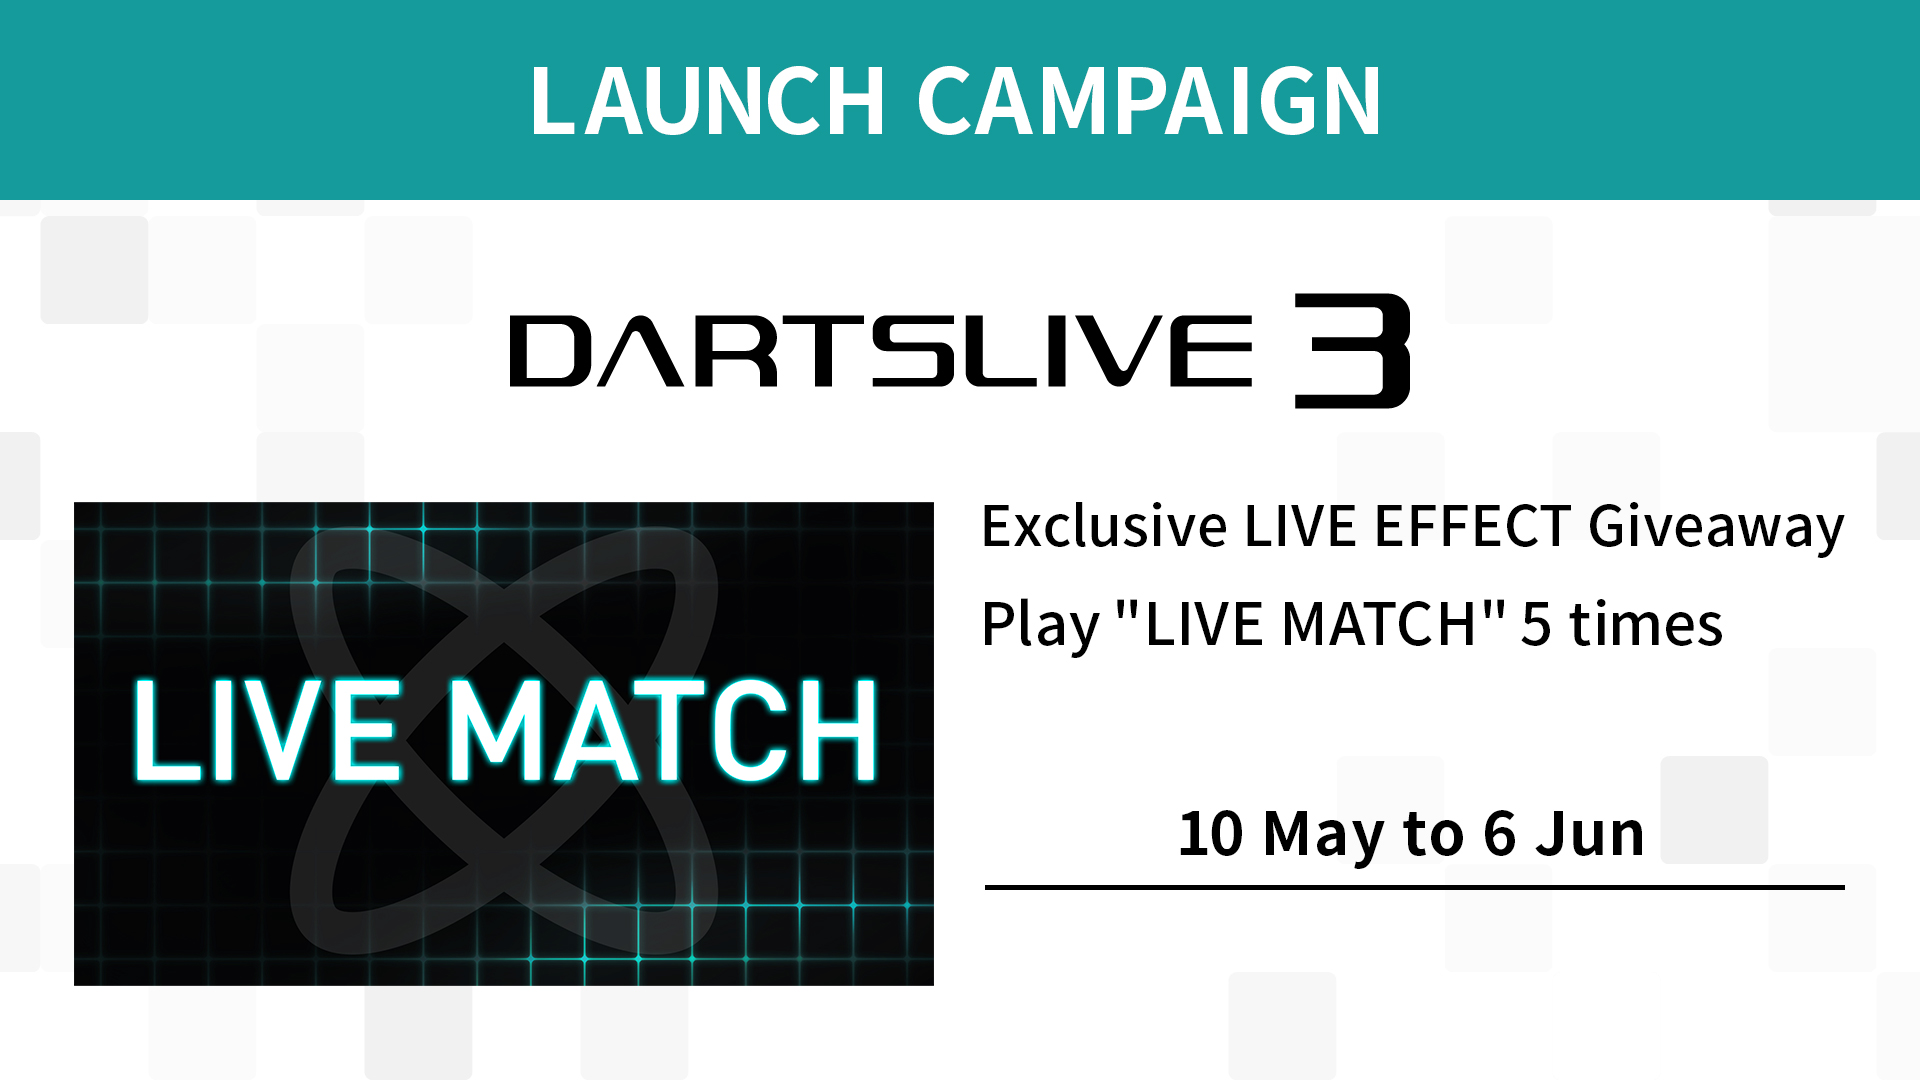 DARTSLIVE3 LAUNCH CAMPAIGN -